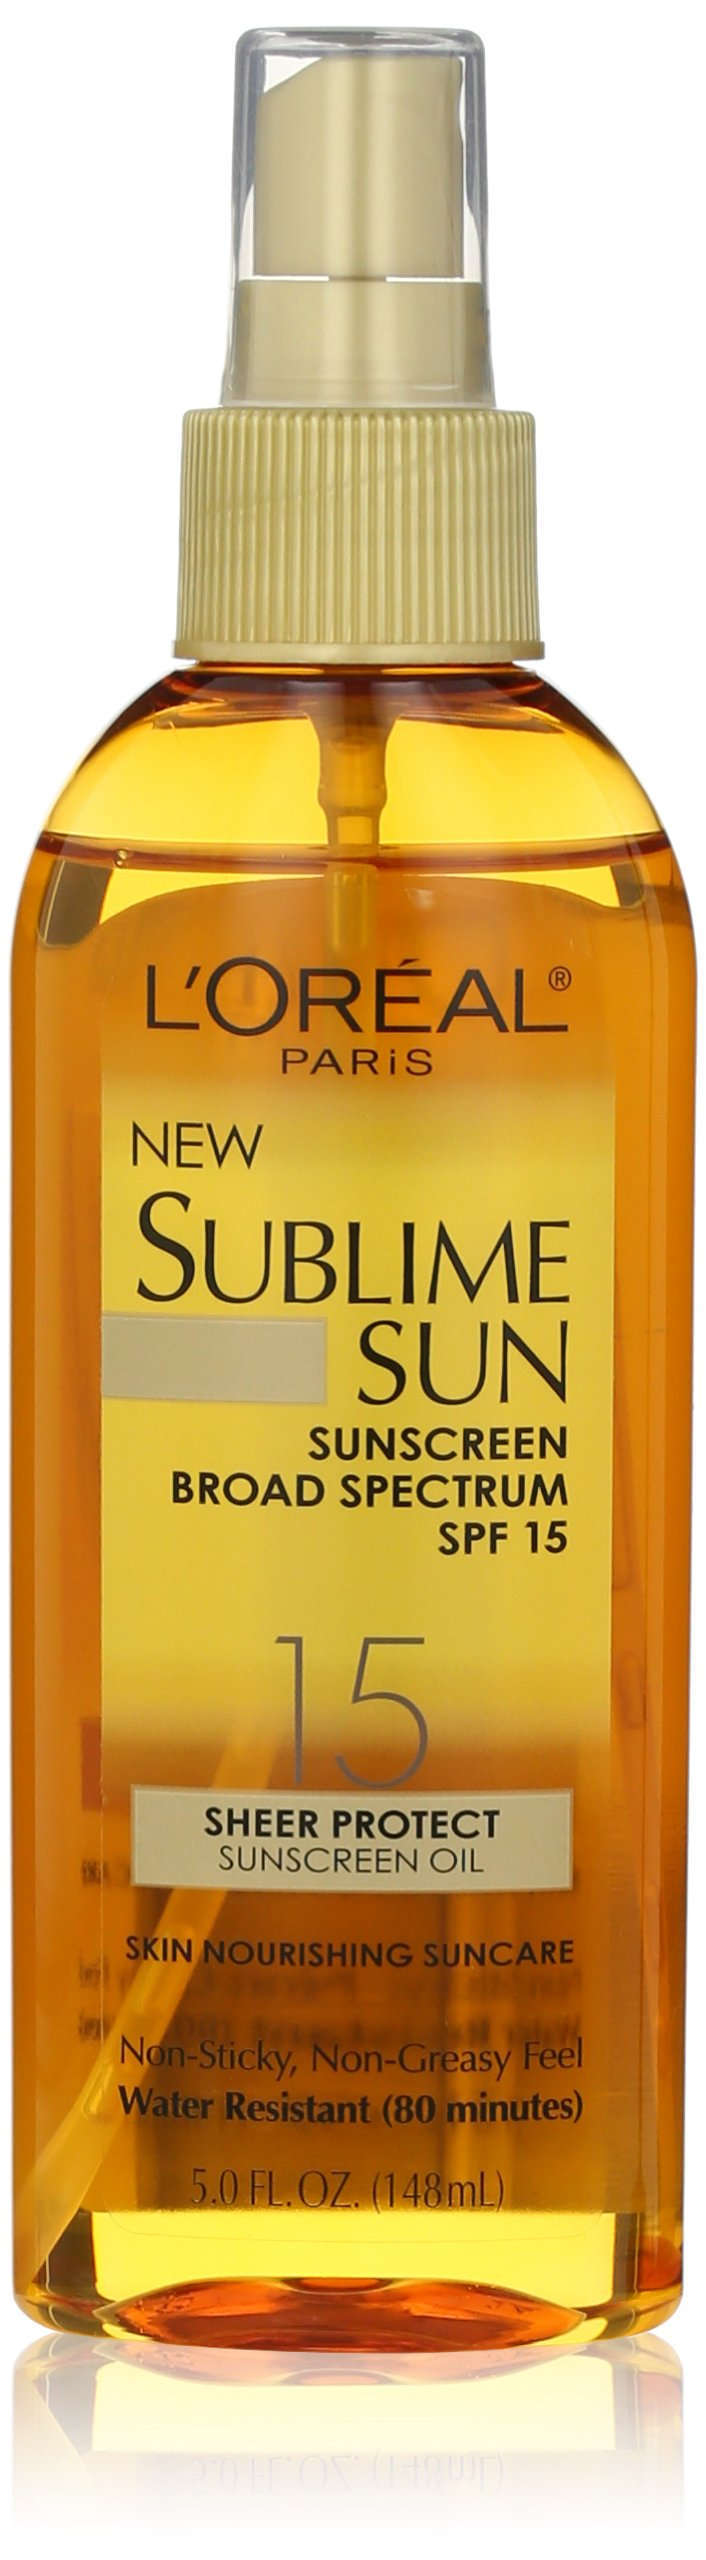 L'Oreal Paris Sublime Sun Advanced Sunscreen Oil Spray SPF 15, 5.0 Ounce by L'Oreal Paris (Image #1)